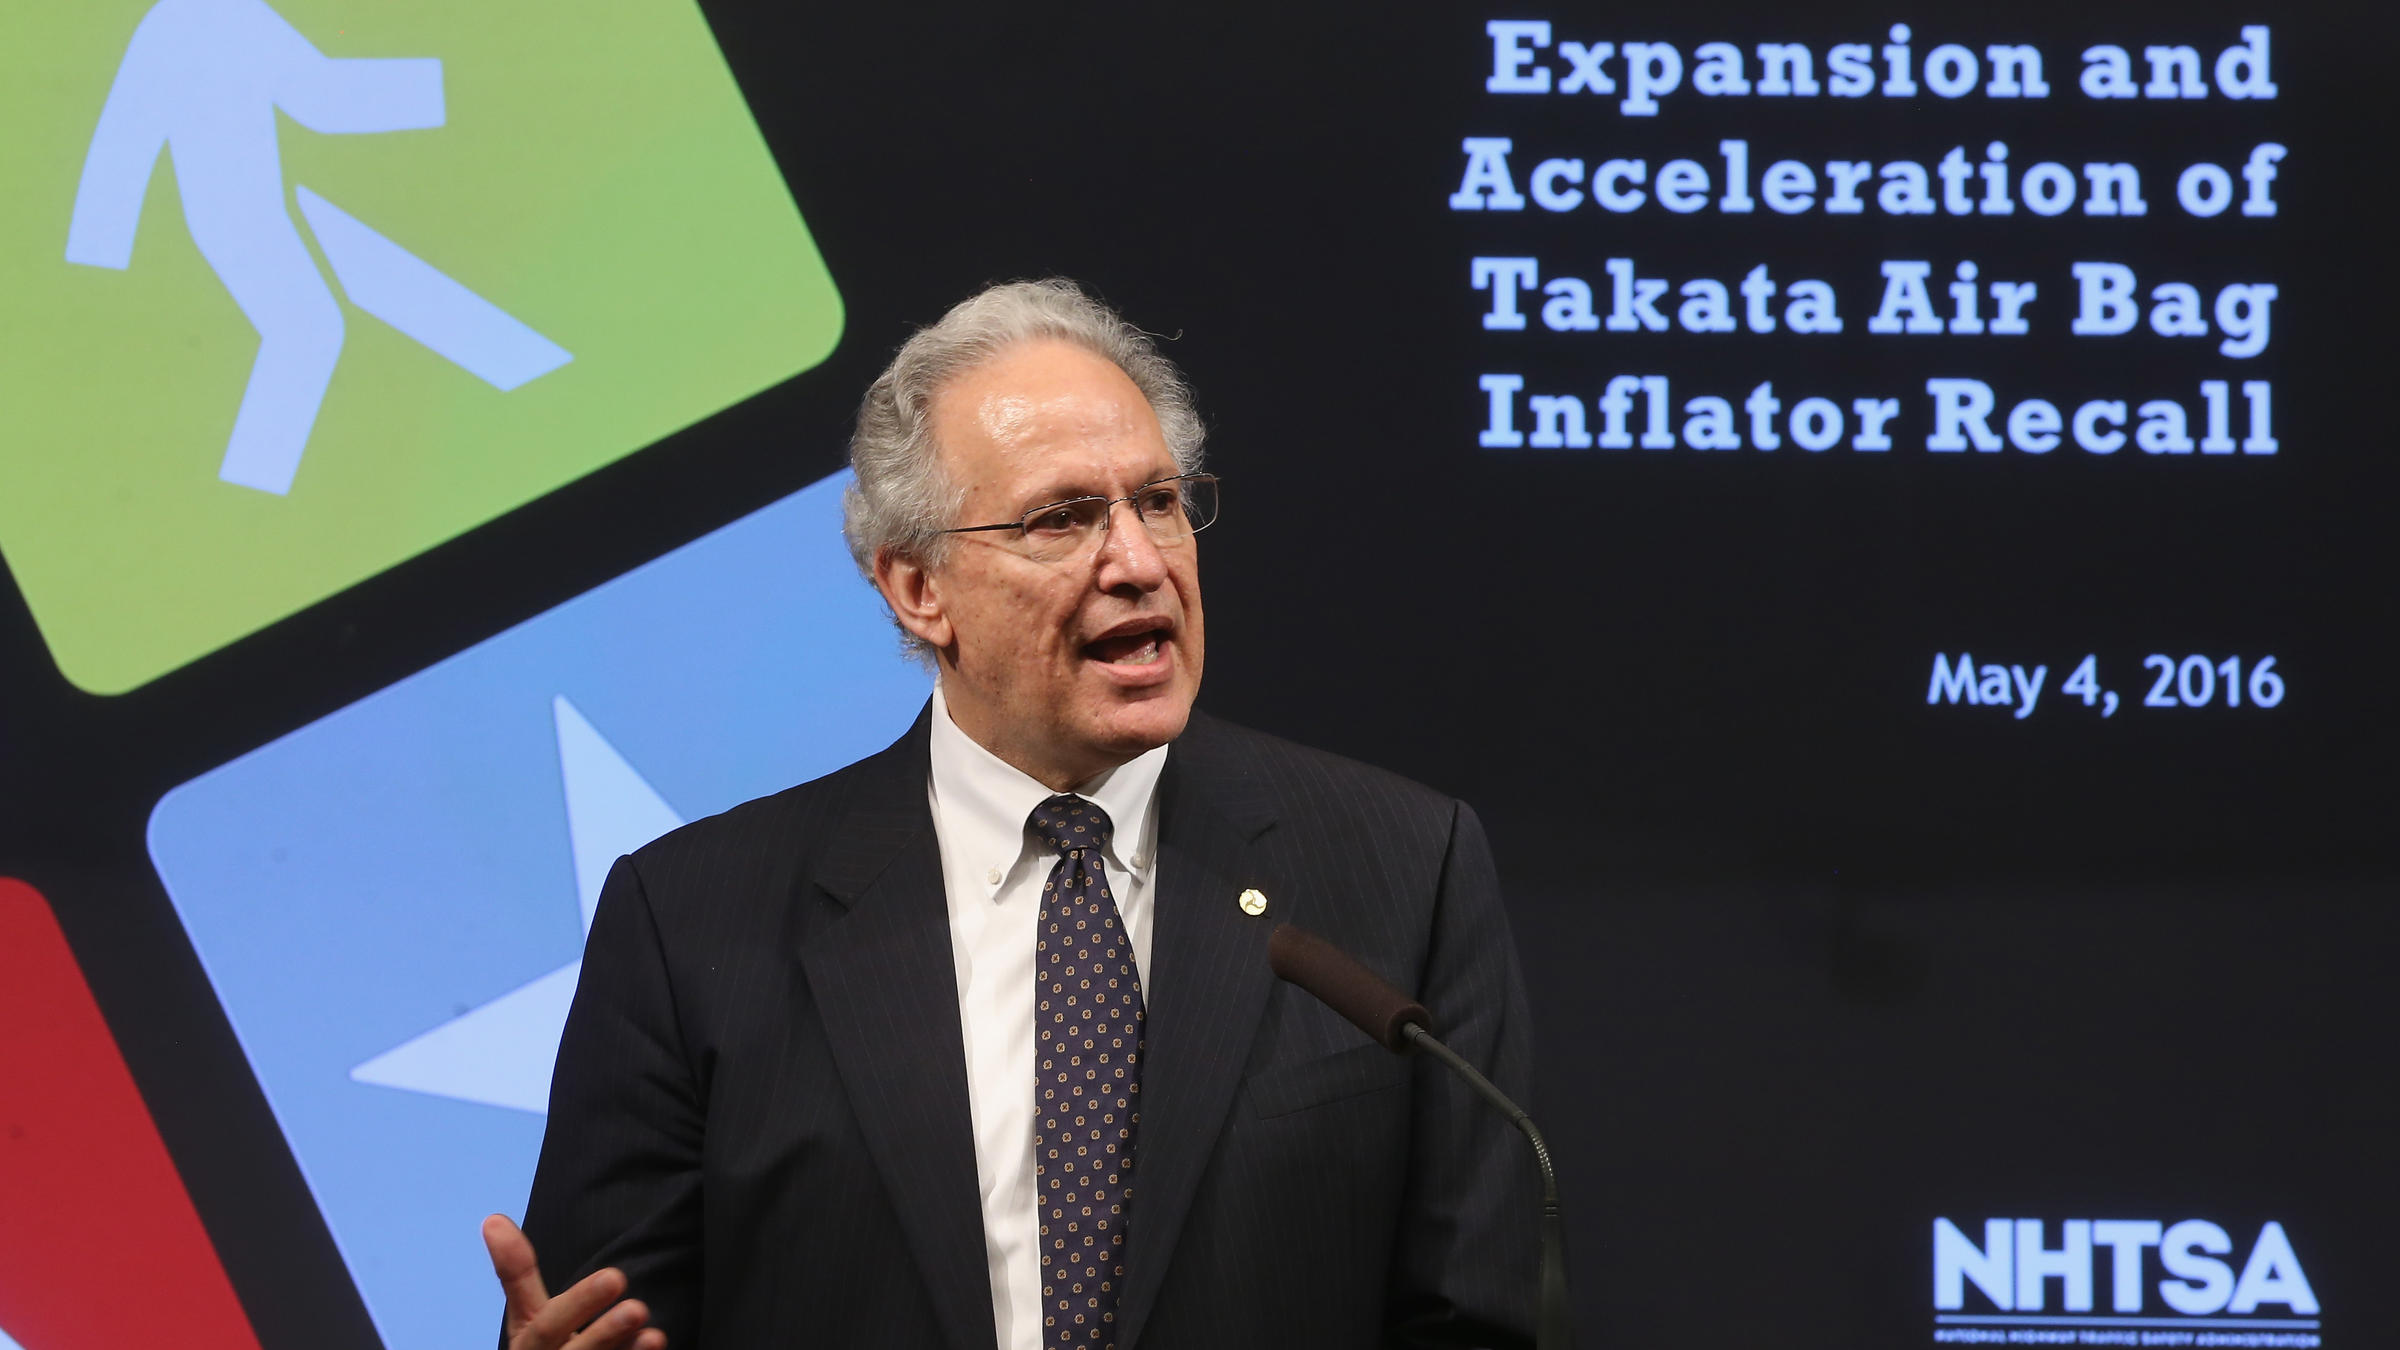 Takata to recall 35 million more air bag inflators